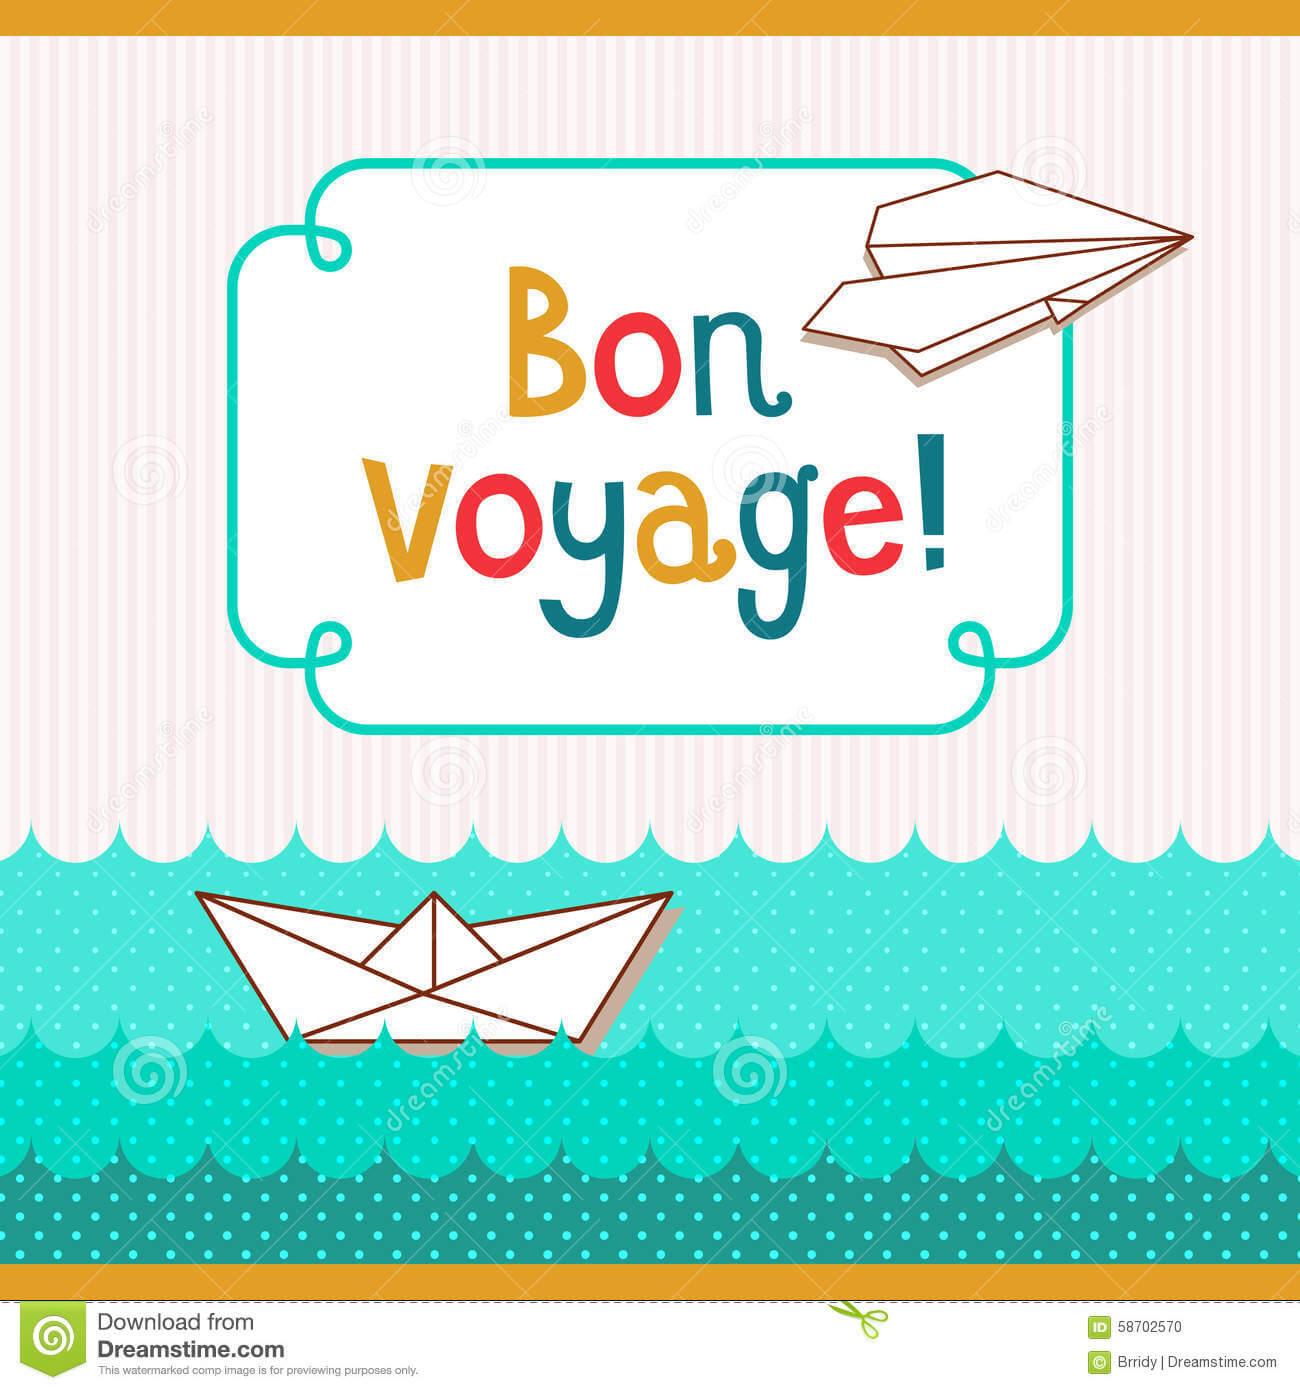 Bon Voyage Card Illustration 58702570 - Megapixl Regarding Bon Voyage Card Template